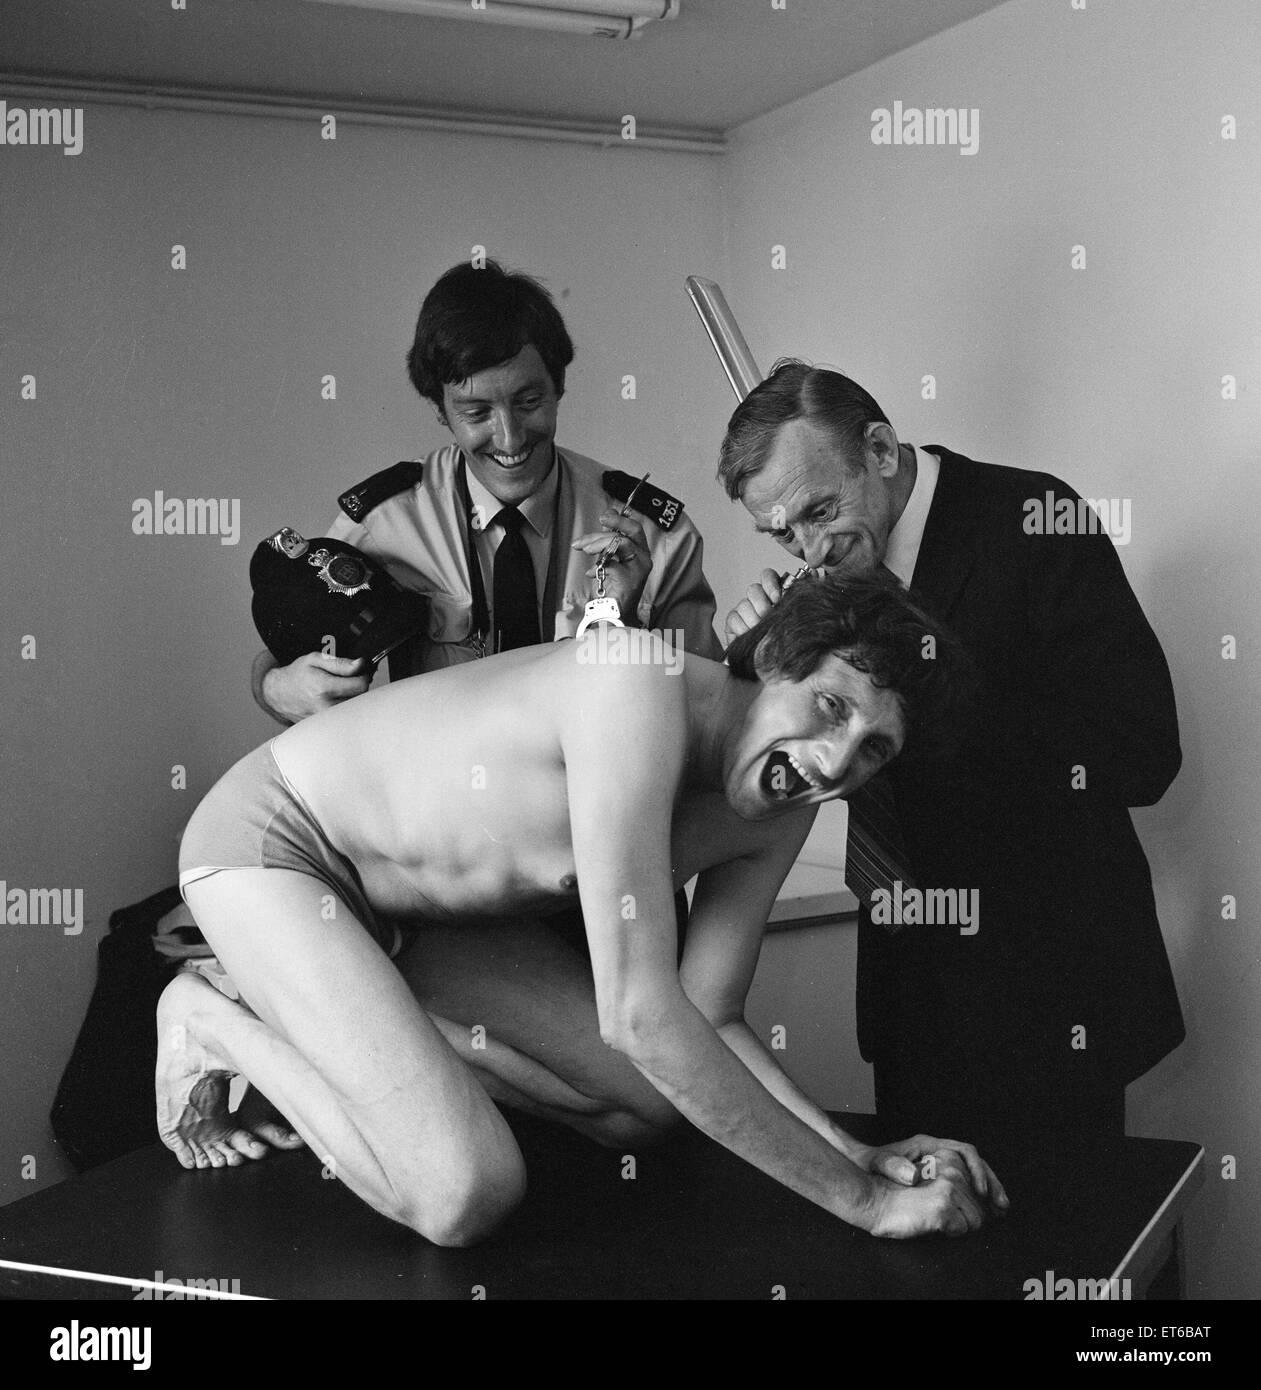 David De Val, Entfesselungskünstler, 1. September 1983. Stockbild